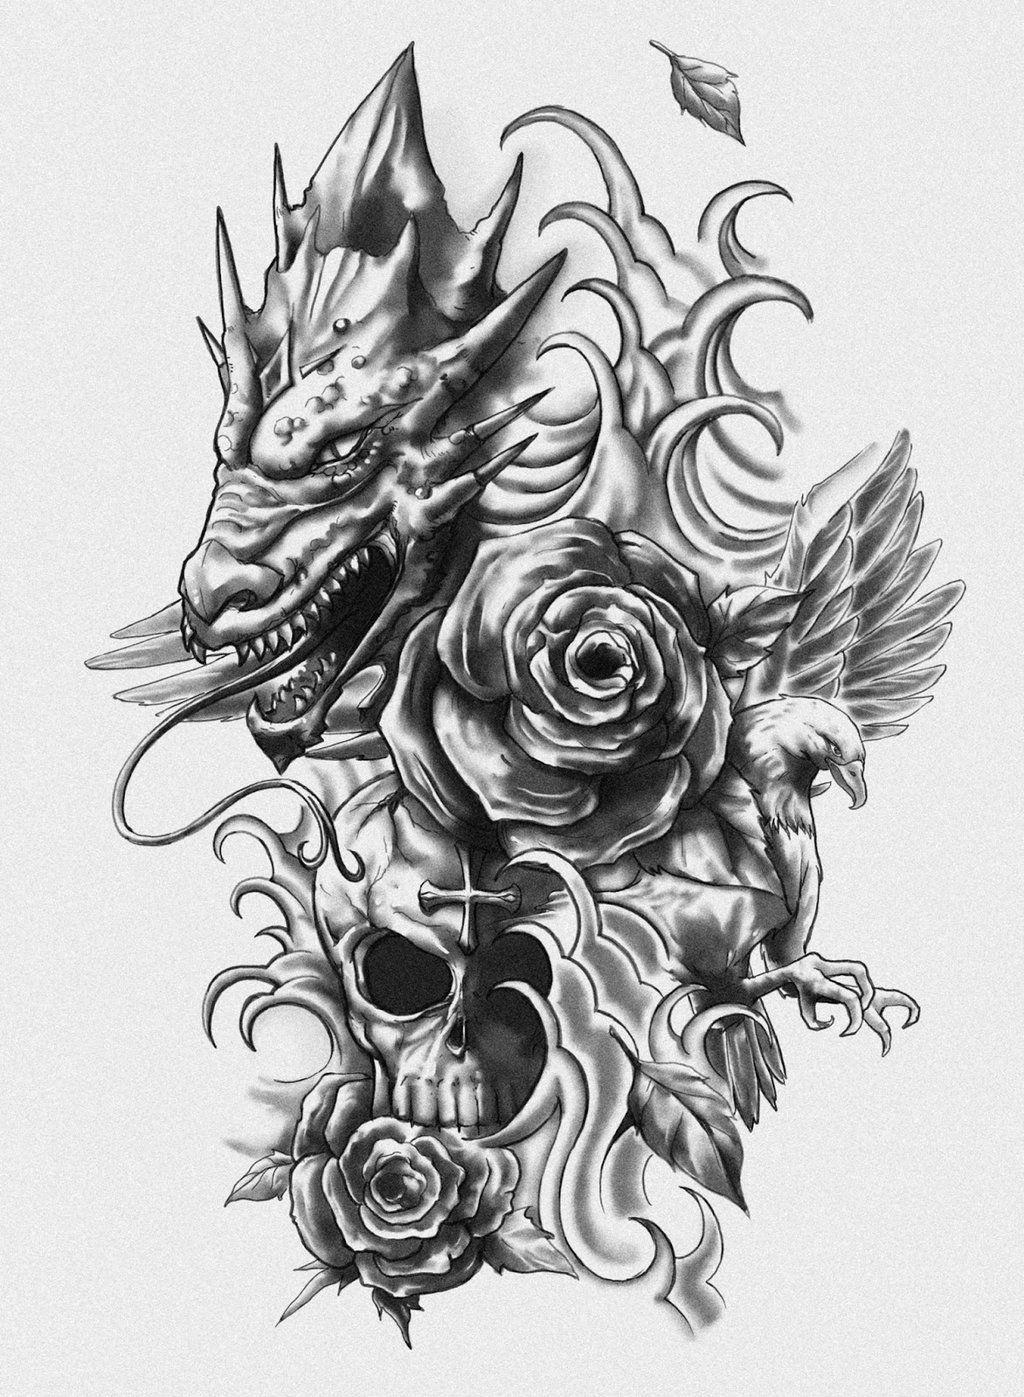 Dragon Skull Eagle Tattoo Design By Crisluspotattoos D6vutdl Jpg 1024 1397 Half Sleeve Tattoos Designs Dragon Tattoo With Skull Eagle Tattoo